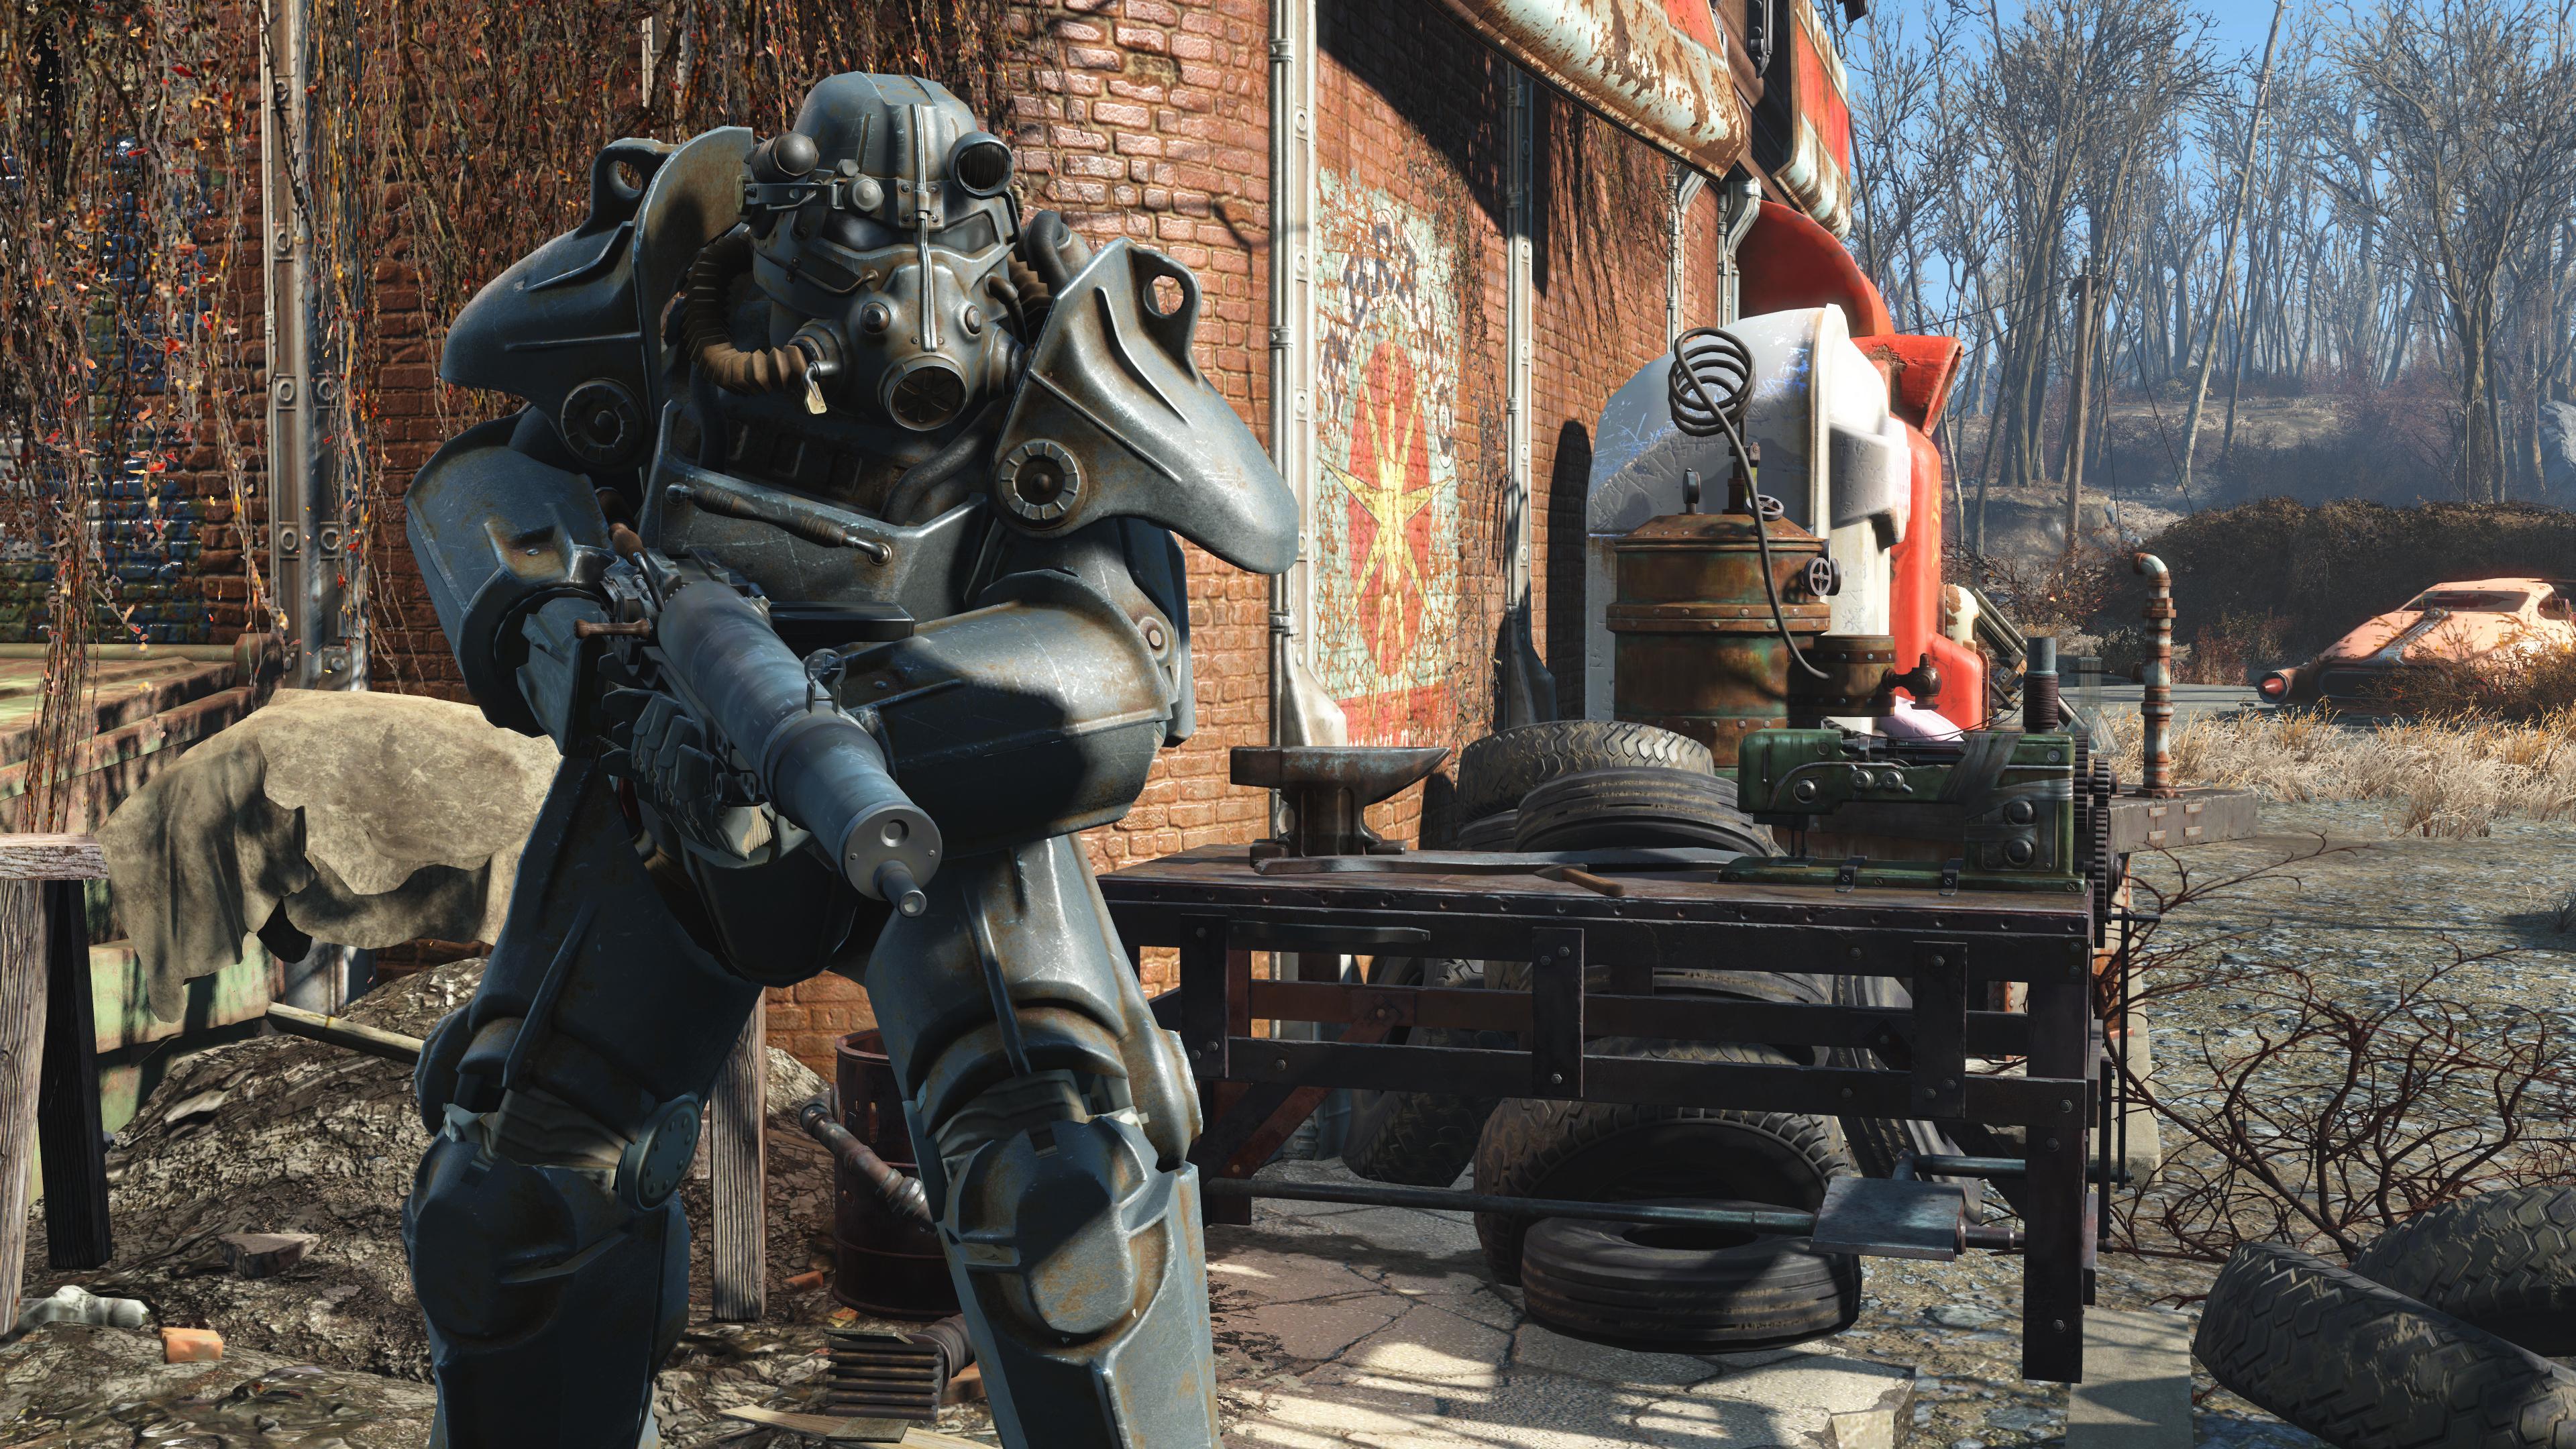 Обновление с текстурами широкого разрешения для Fallout 4 весит 58 Гб